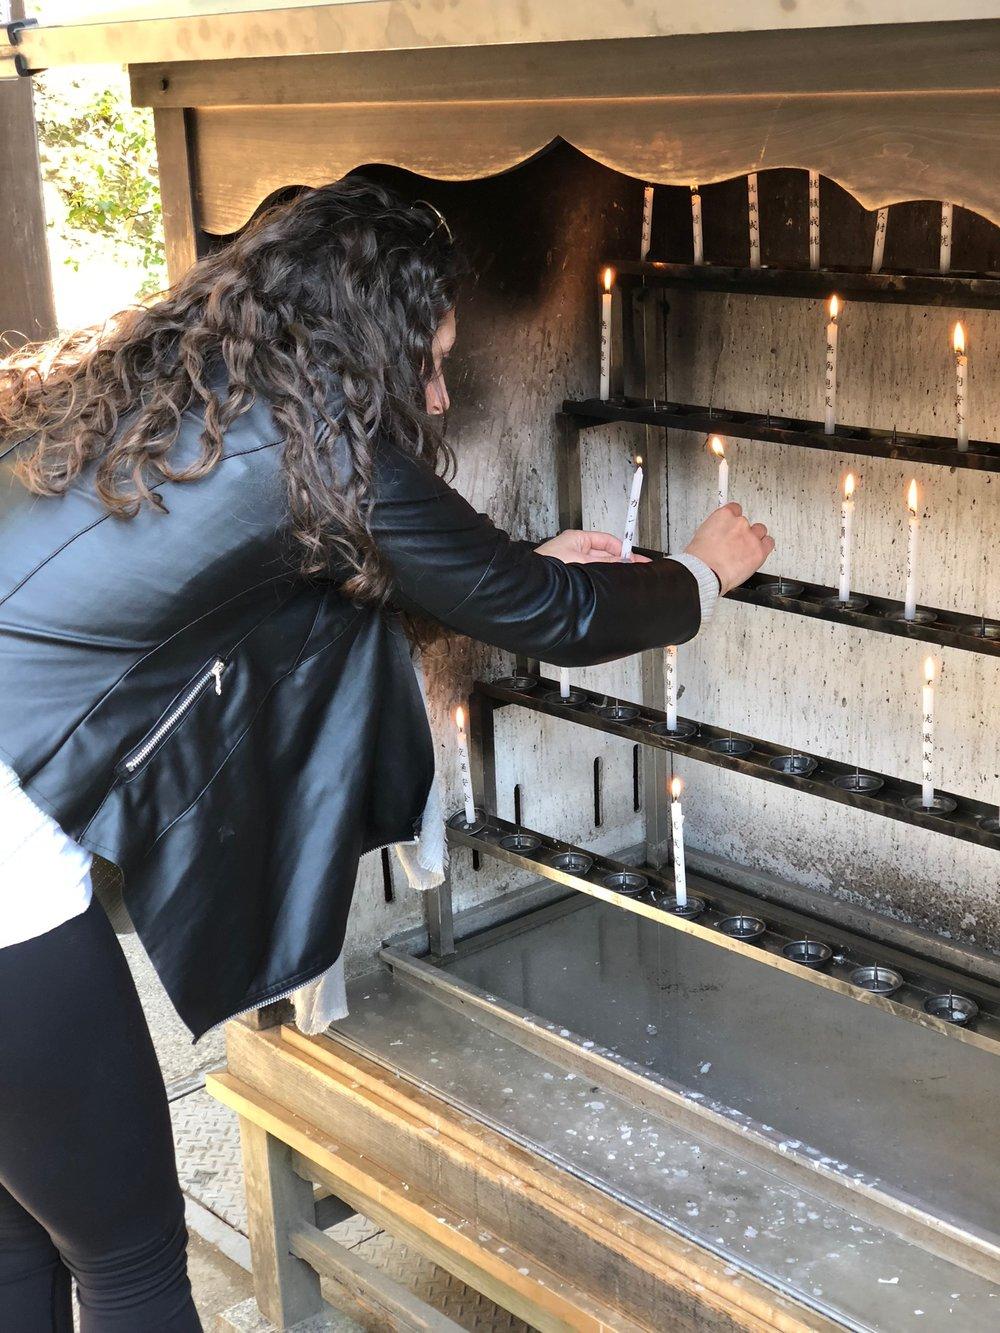 Alix lighting a prayer candle at the shrine on the grounds of Kinkaku-ji.